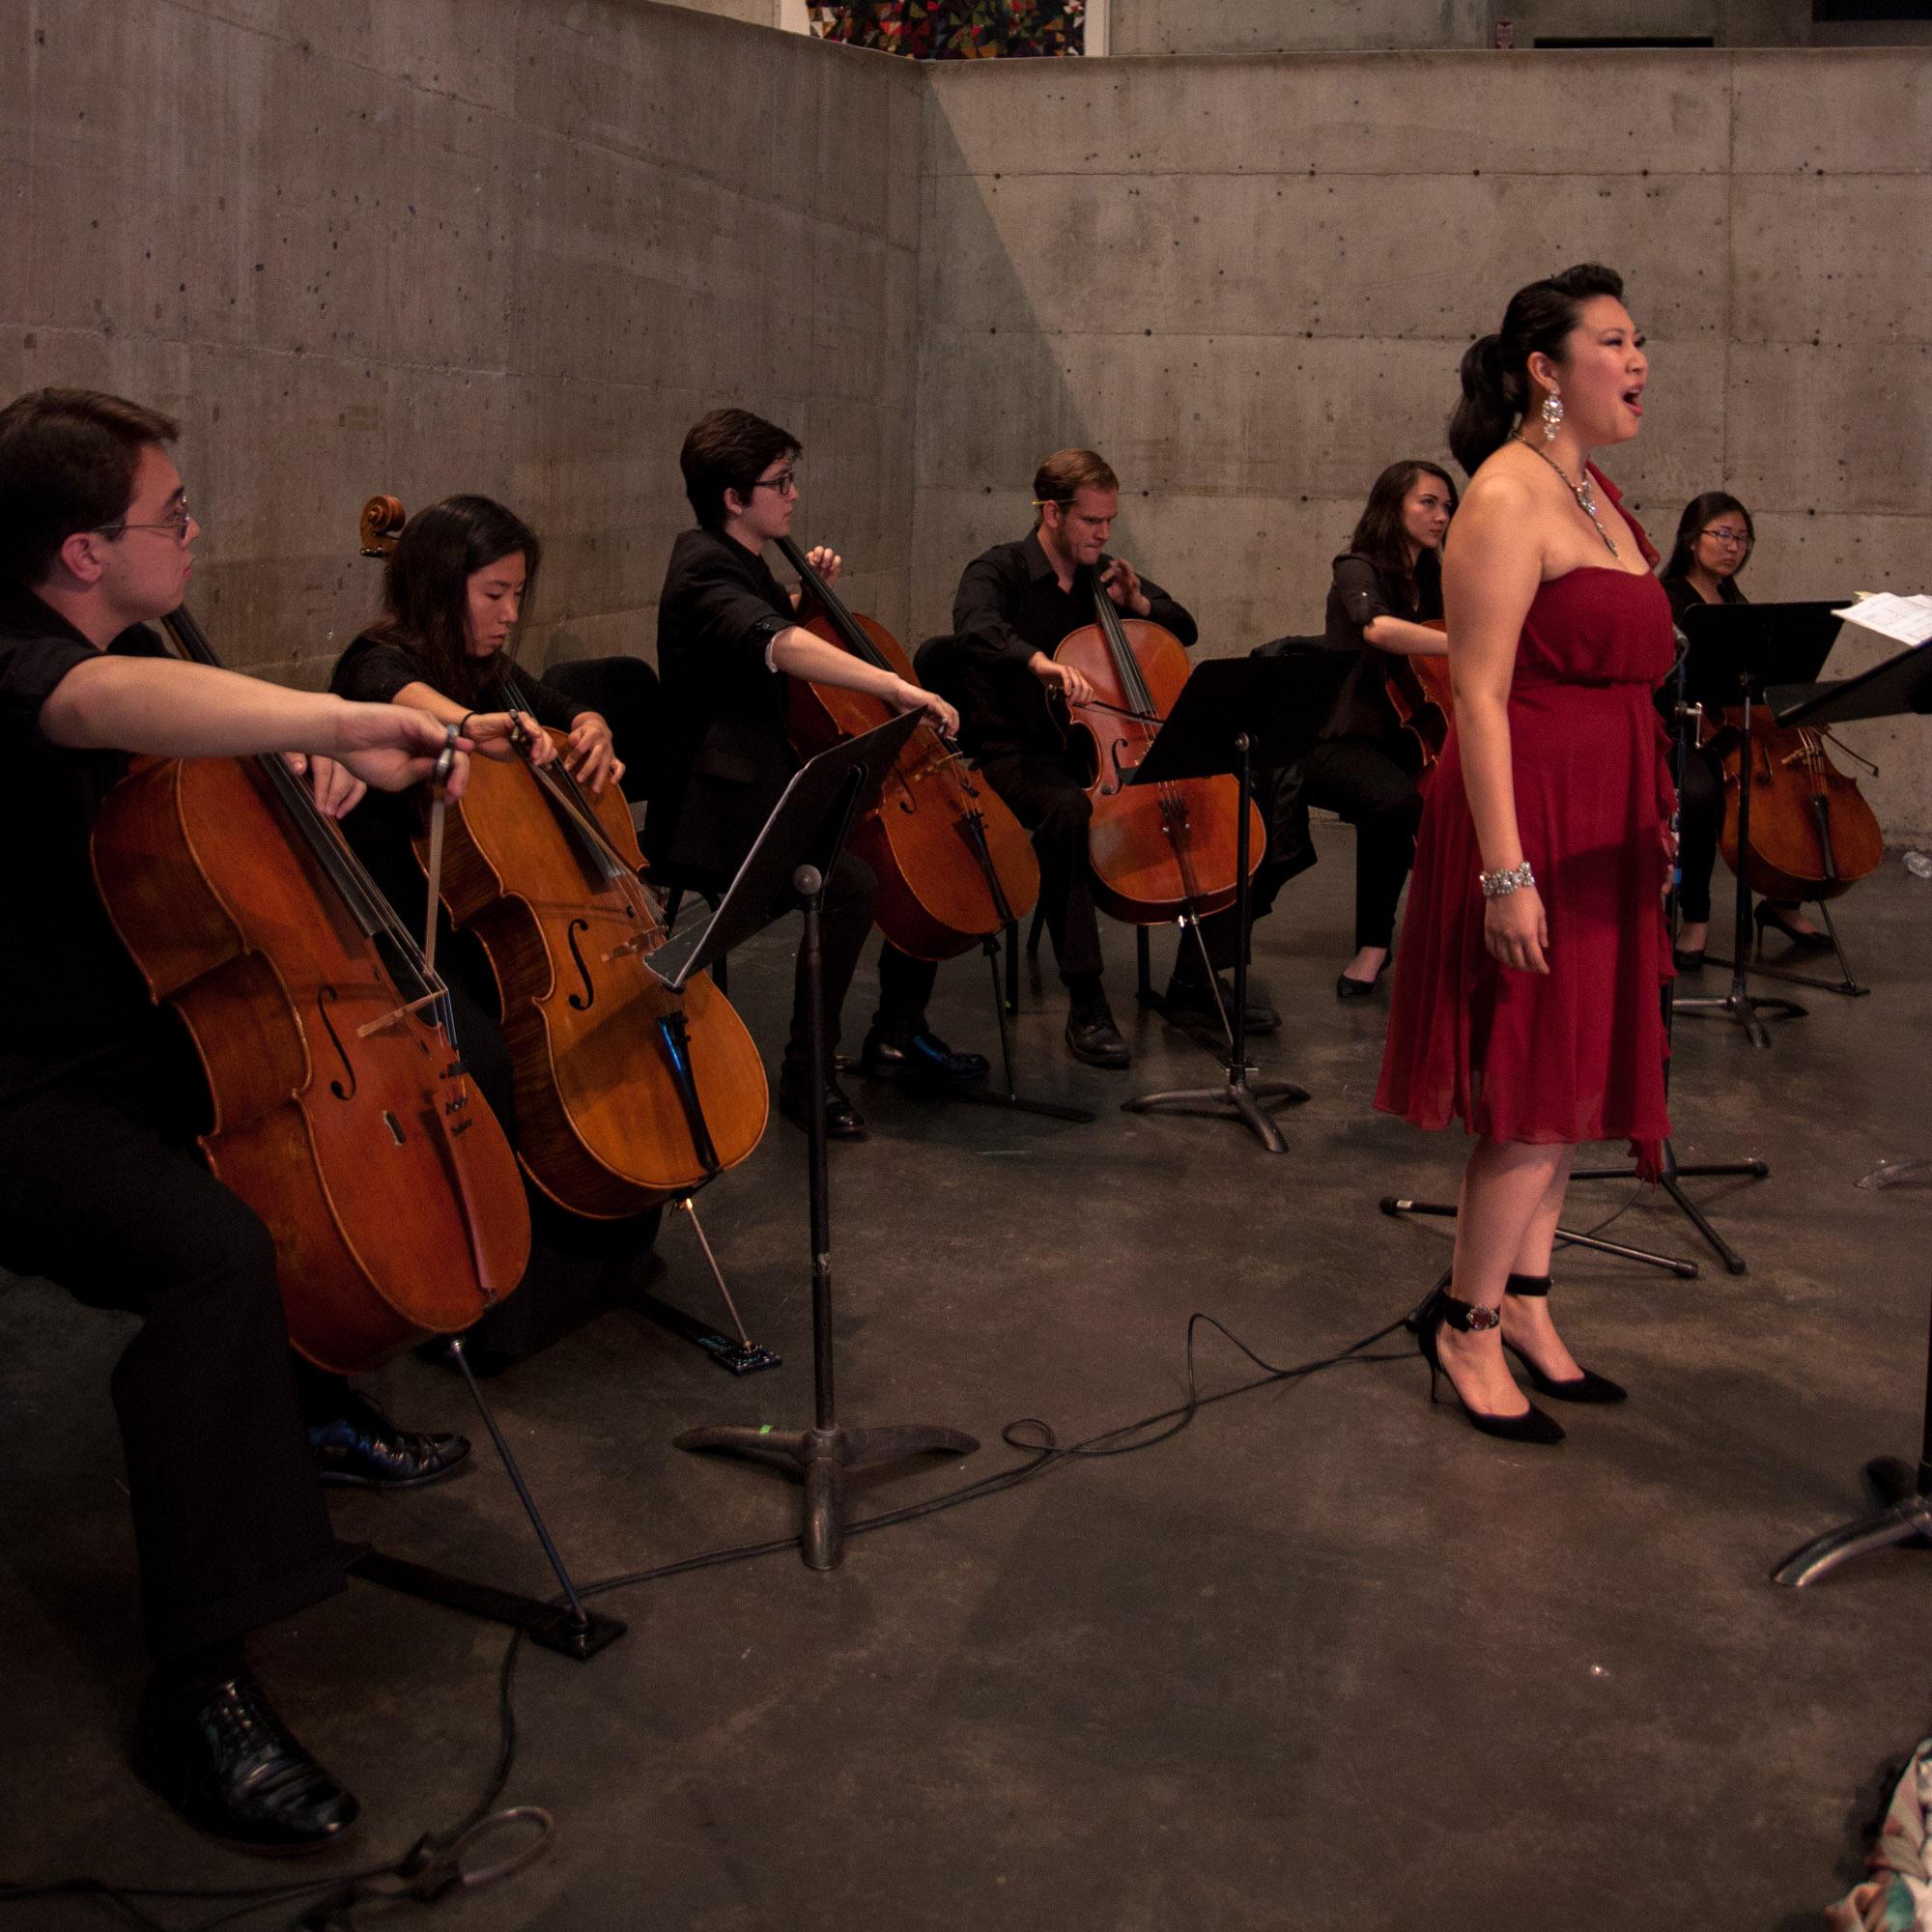 Villa-Lobos' Bachianas Brasileiras no. 5 with Celli@Berkeley. Berkeley Art Museum.